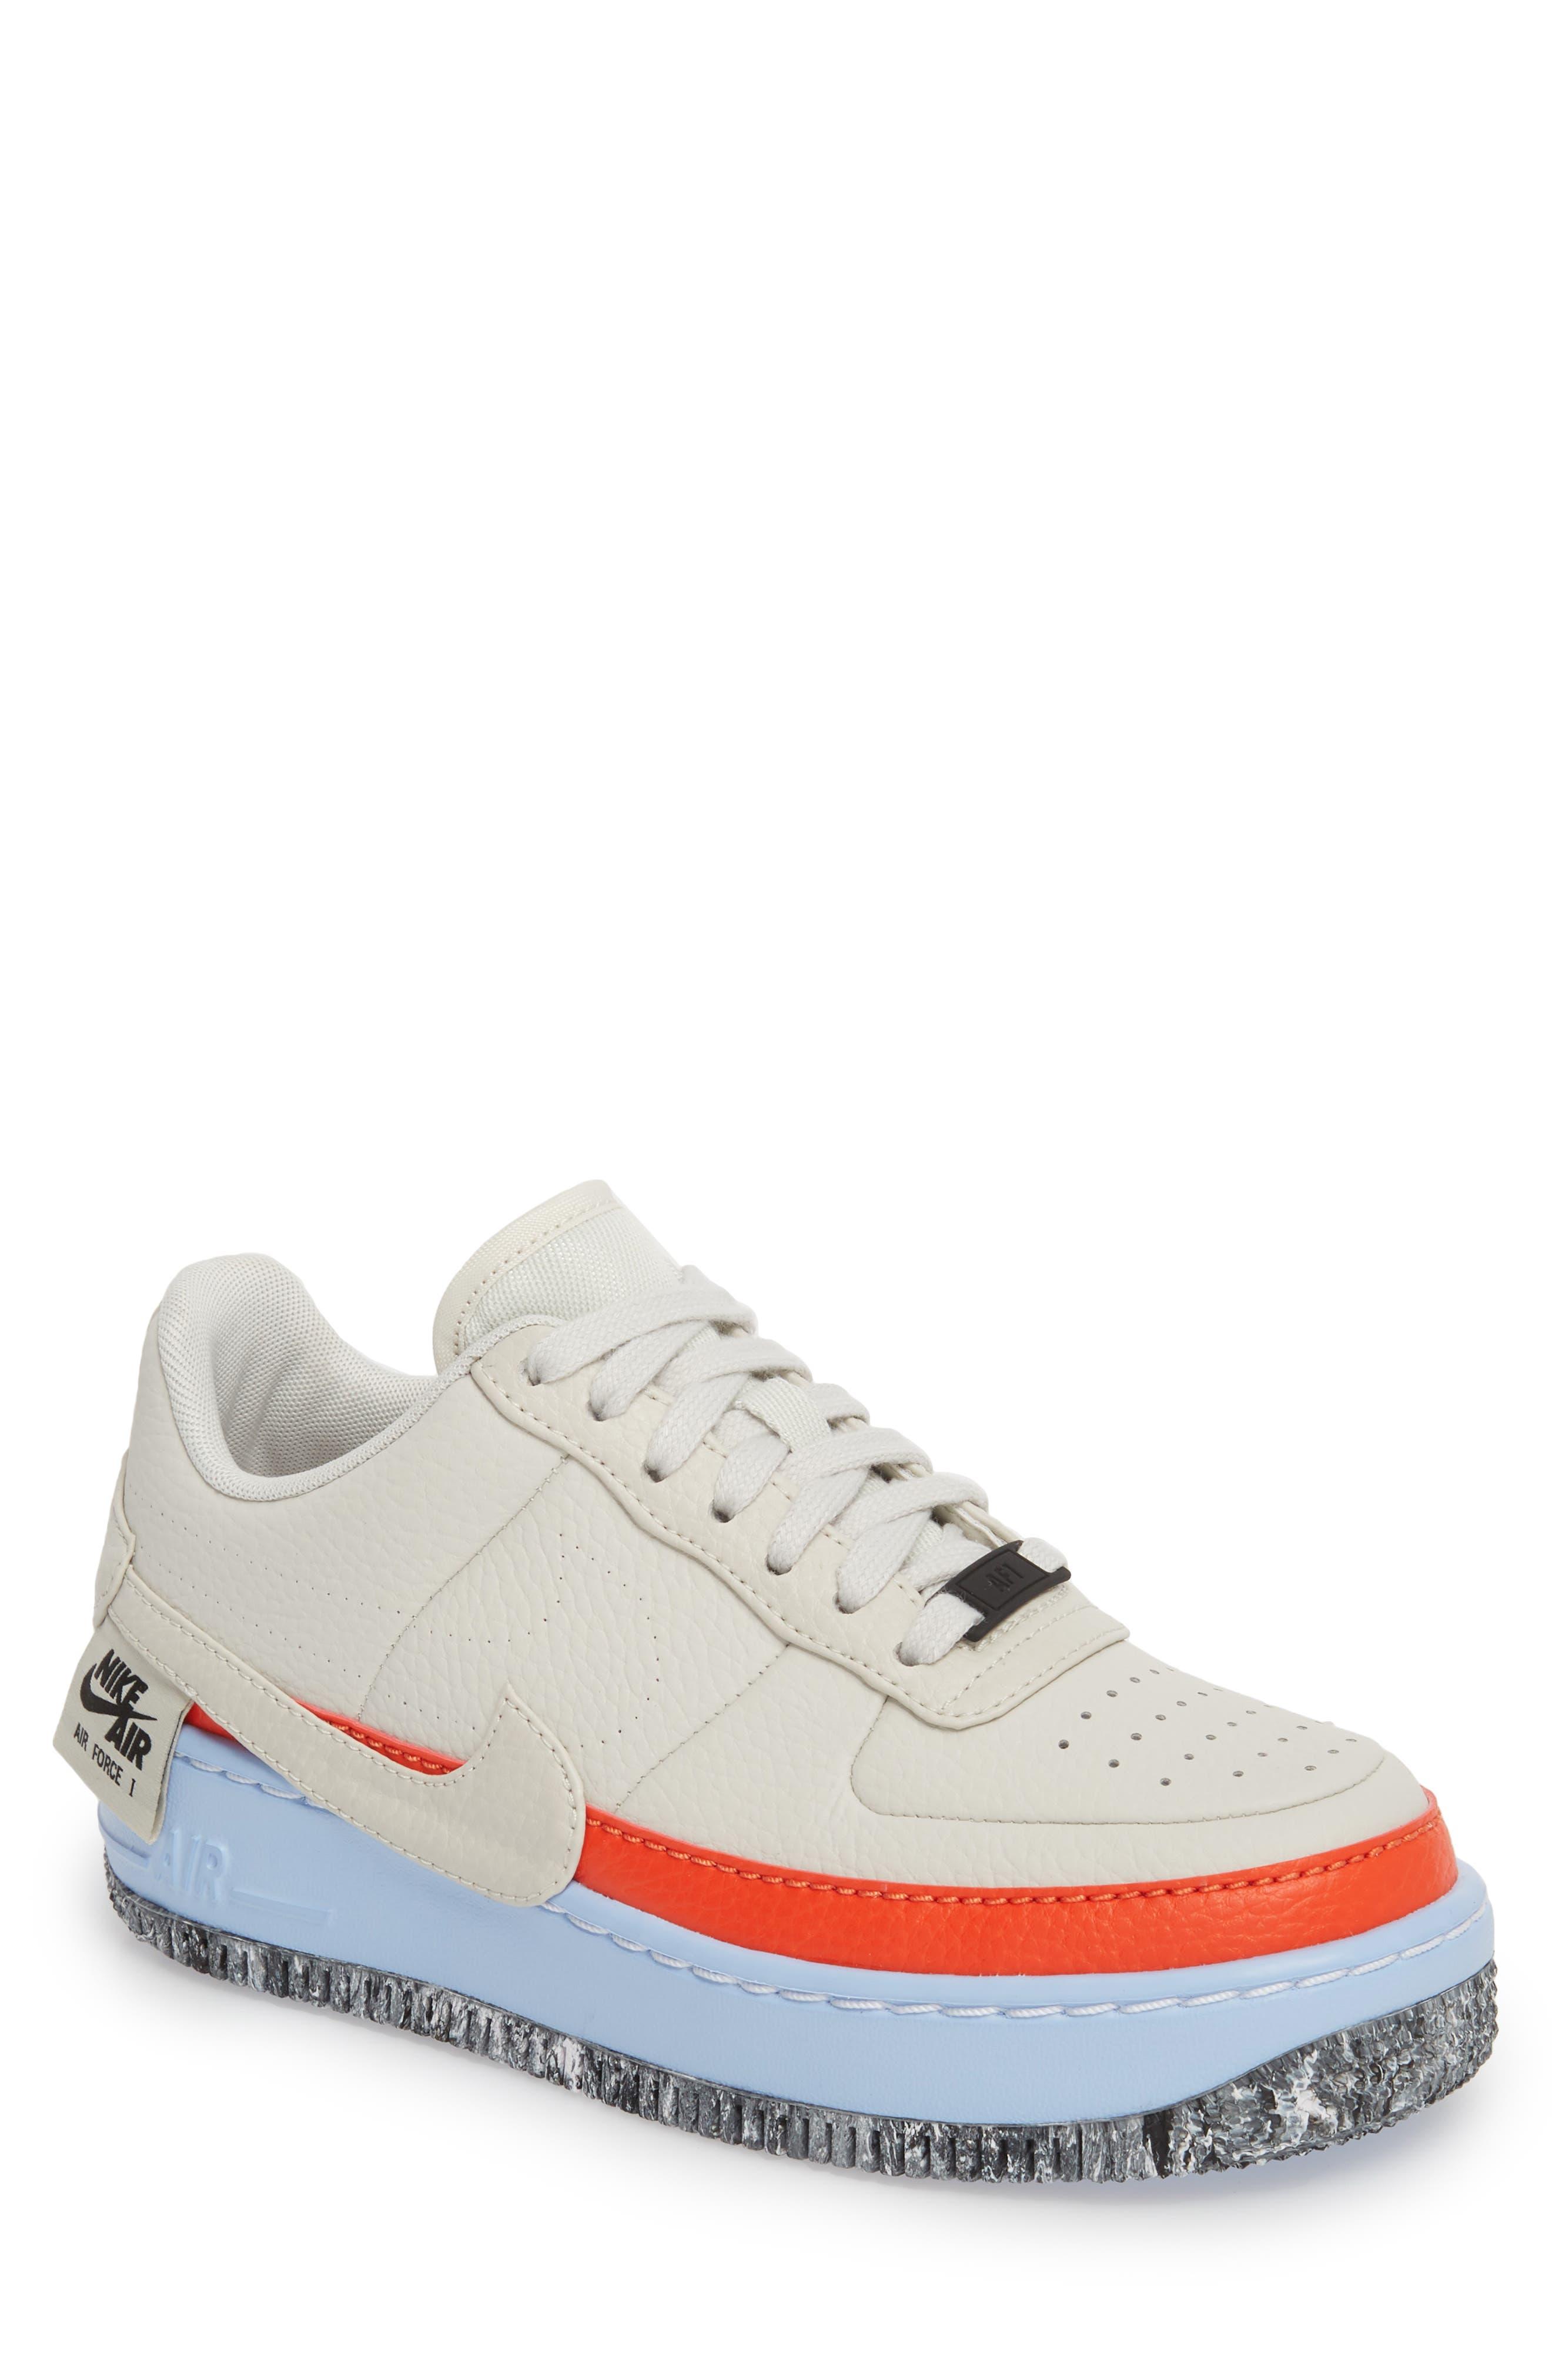 Air Force 1 Jester XX Sneaker,                         Main,                         color, LIGHT BONE/ TEAM ORANGE